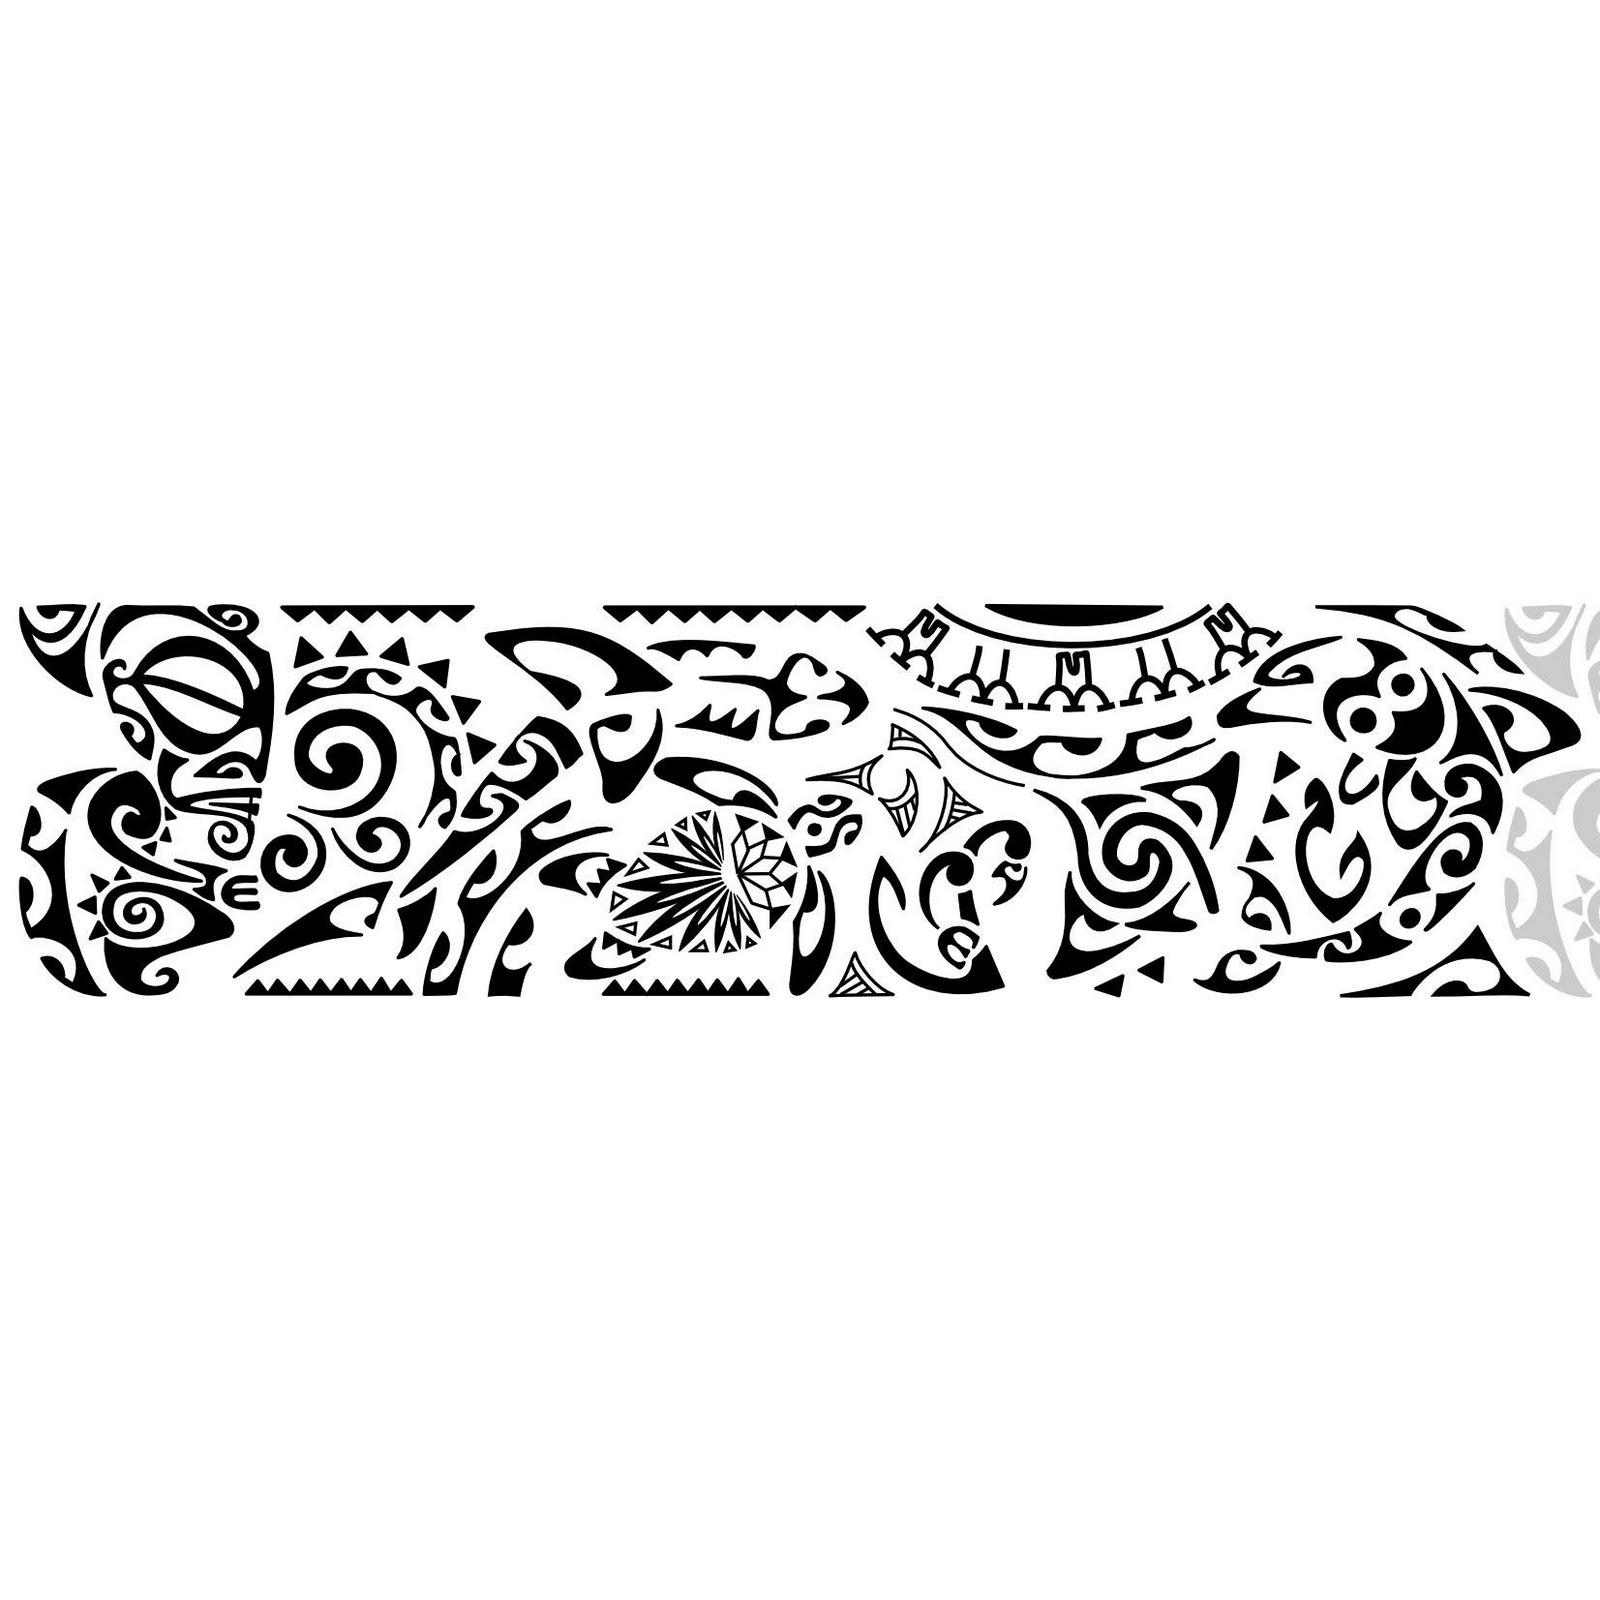 Super Blu Sky Tattoo Studio: Maori Significato 80 RG71